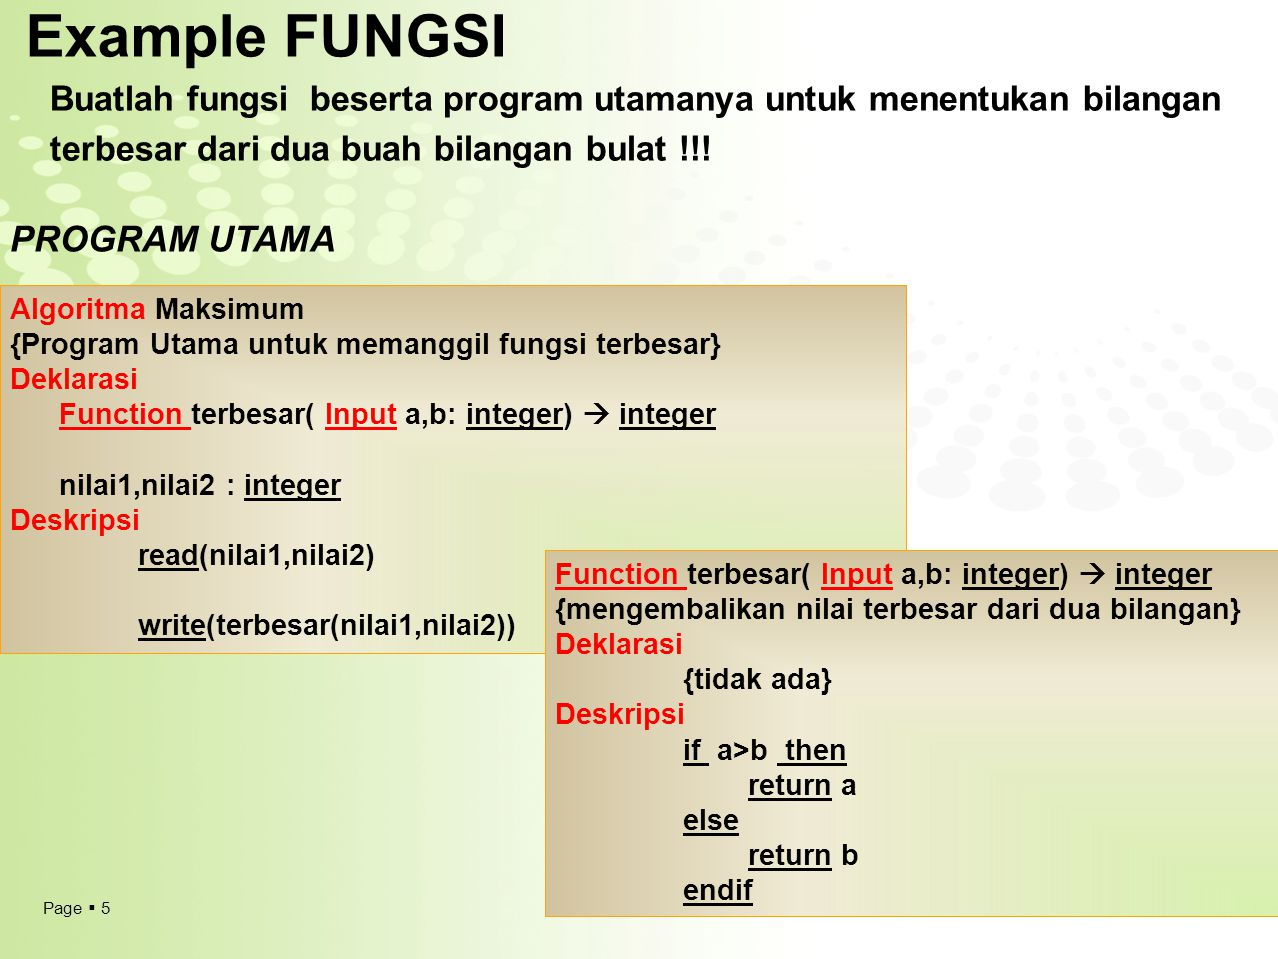 Page  6 Translasi pseudocode fungsi ke C ++ #include using namespace std; int terbesar (int a,int b); void main() {int nilai1,nilai2; cout<< NILAI 1 ? ; cin>>nilai1; cout<< NILAI 2 ? ; cin>>nilai2; cout<< Nilai Terbesar adalah <<terbesar(nilai1,nilai2); system( pause ); } int terbesar (int a,int b) { if (a>b) {return a;} else {return b;} } int terbesar (int a,int b) { if (a>b) {return a;} else {return b;} }